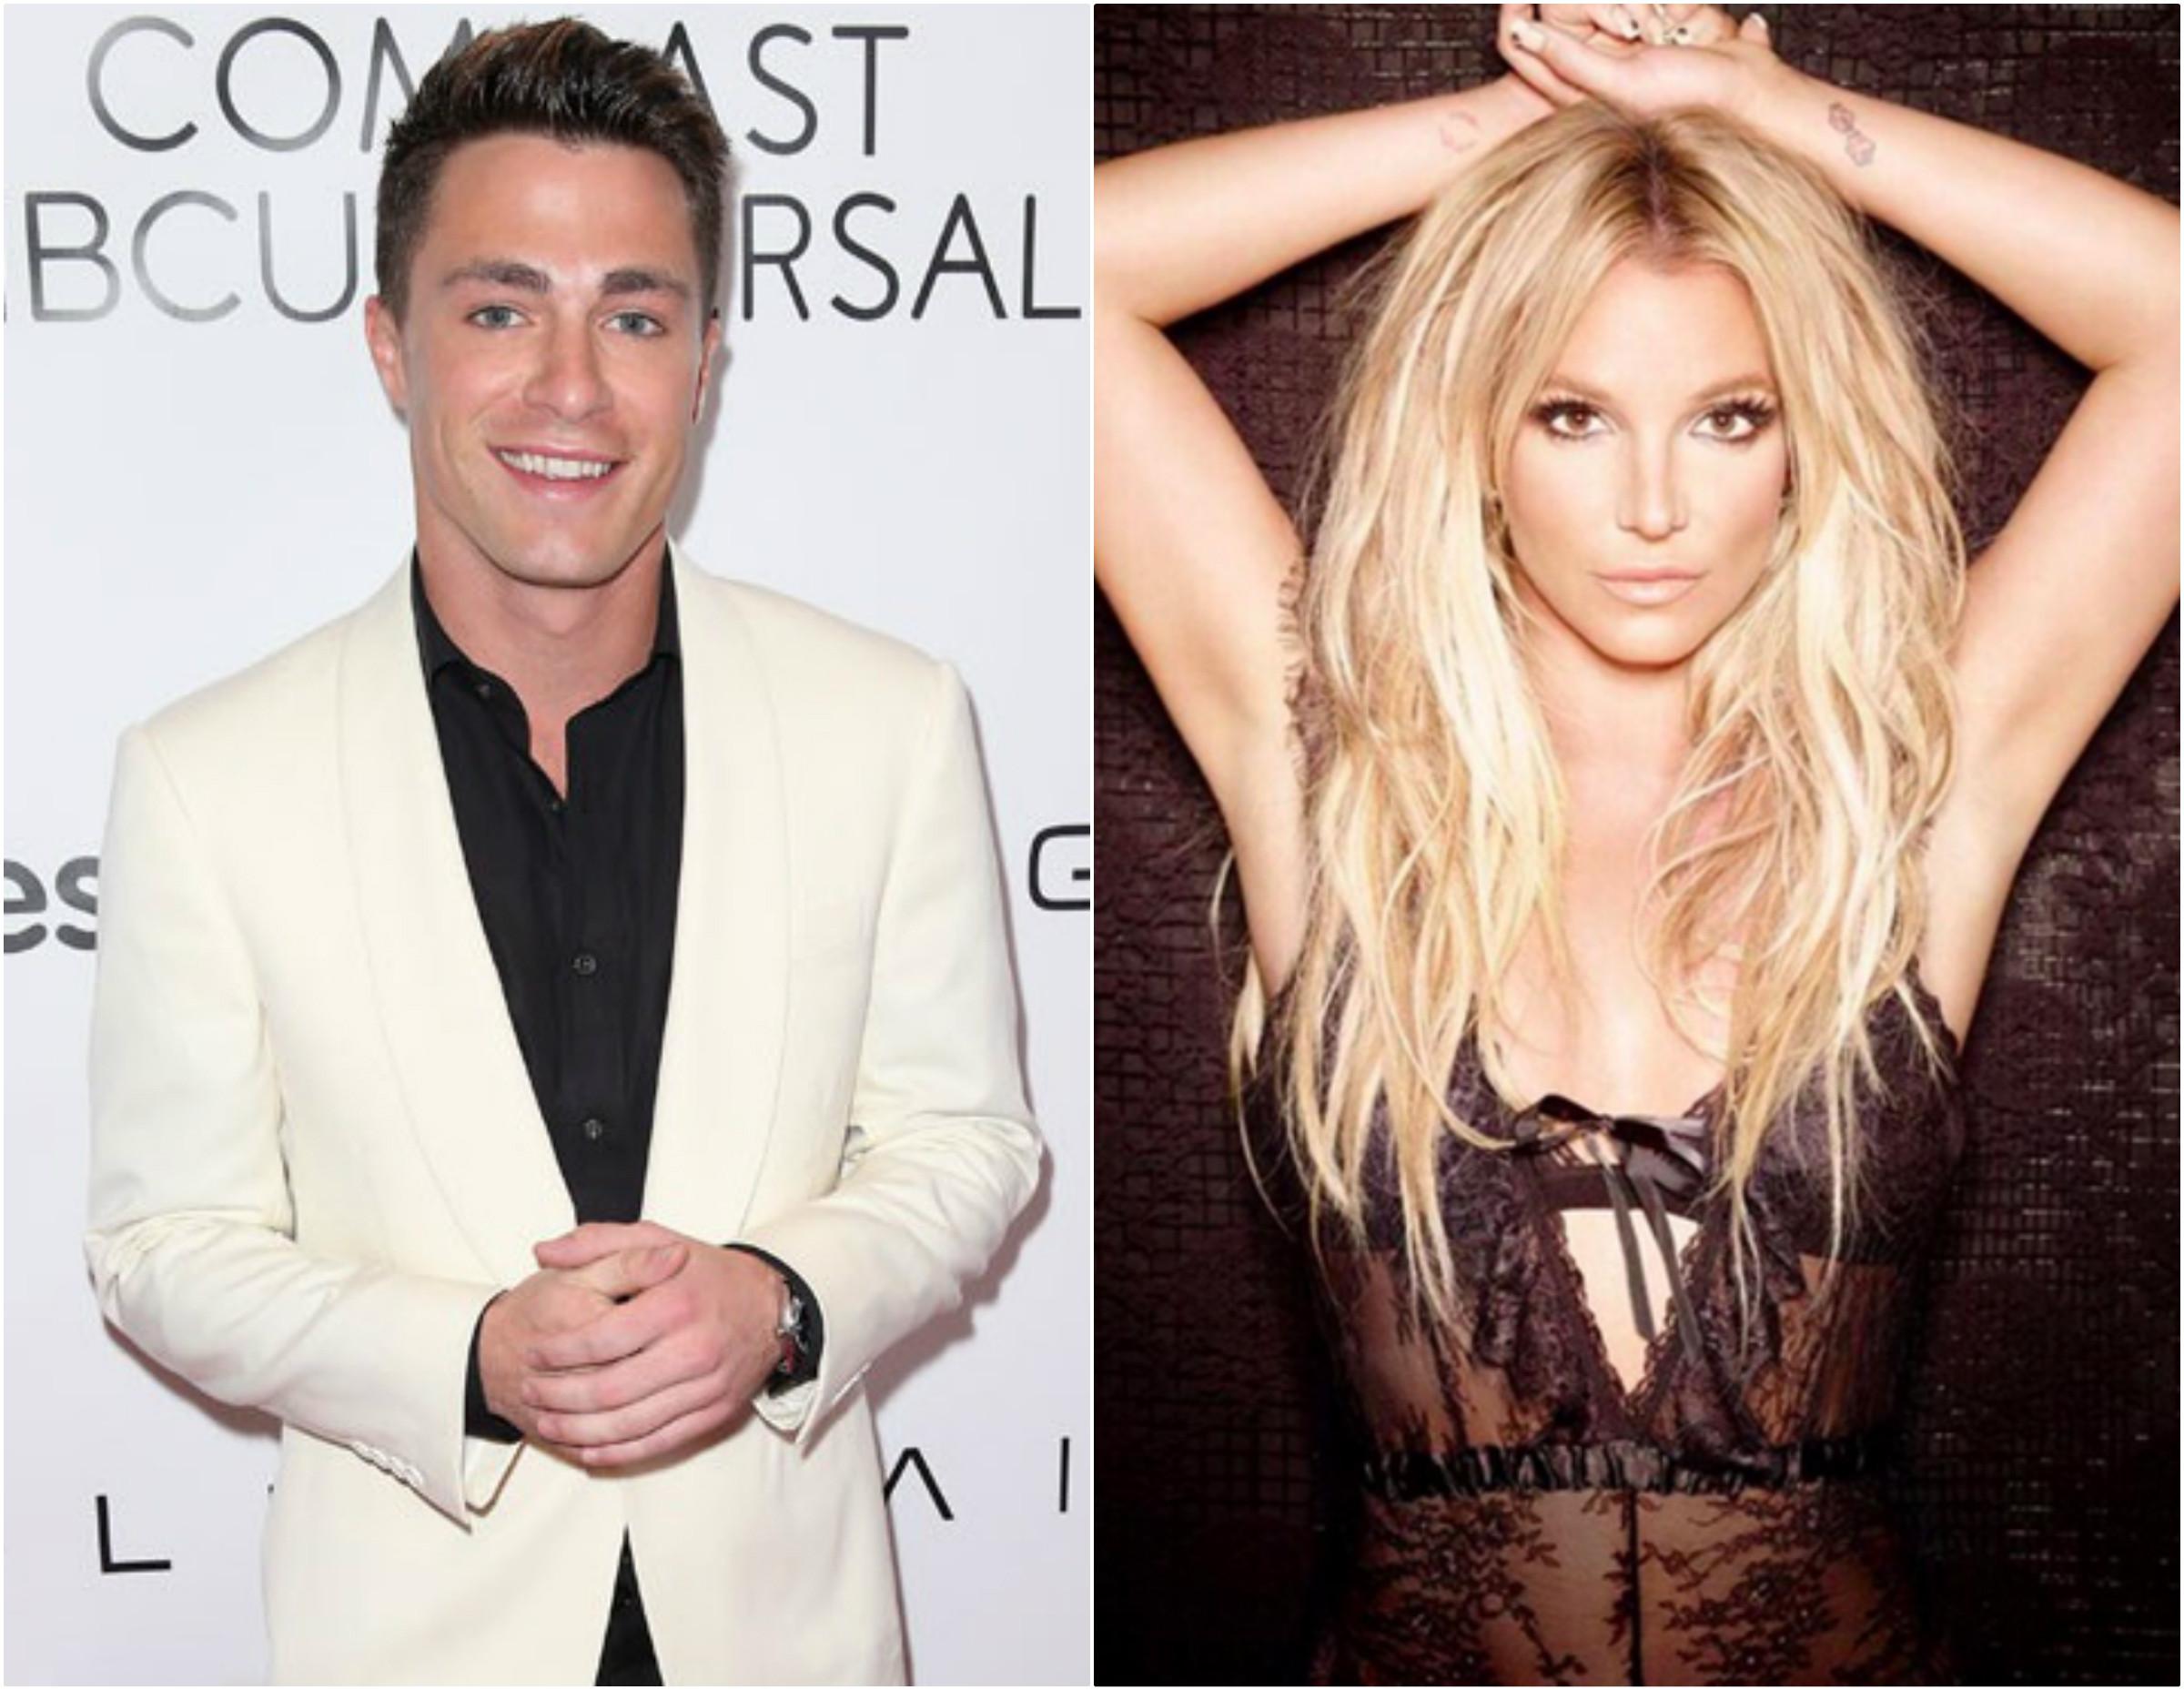 Colton Haynes, Britney Spears